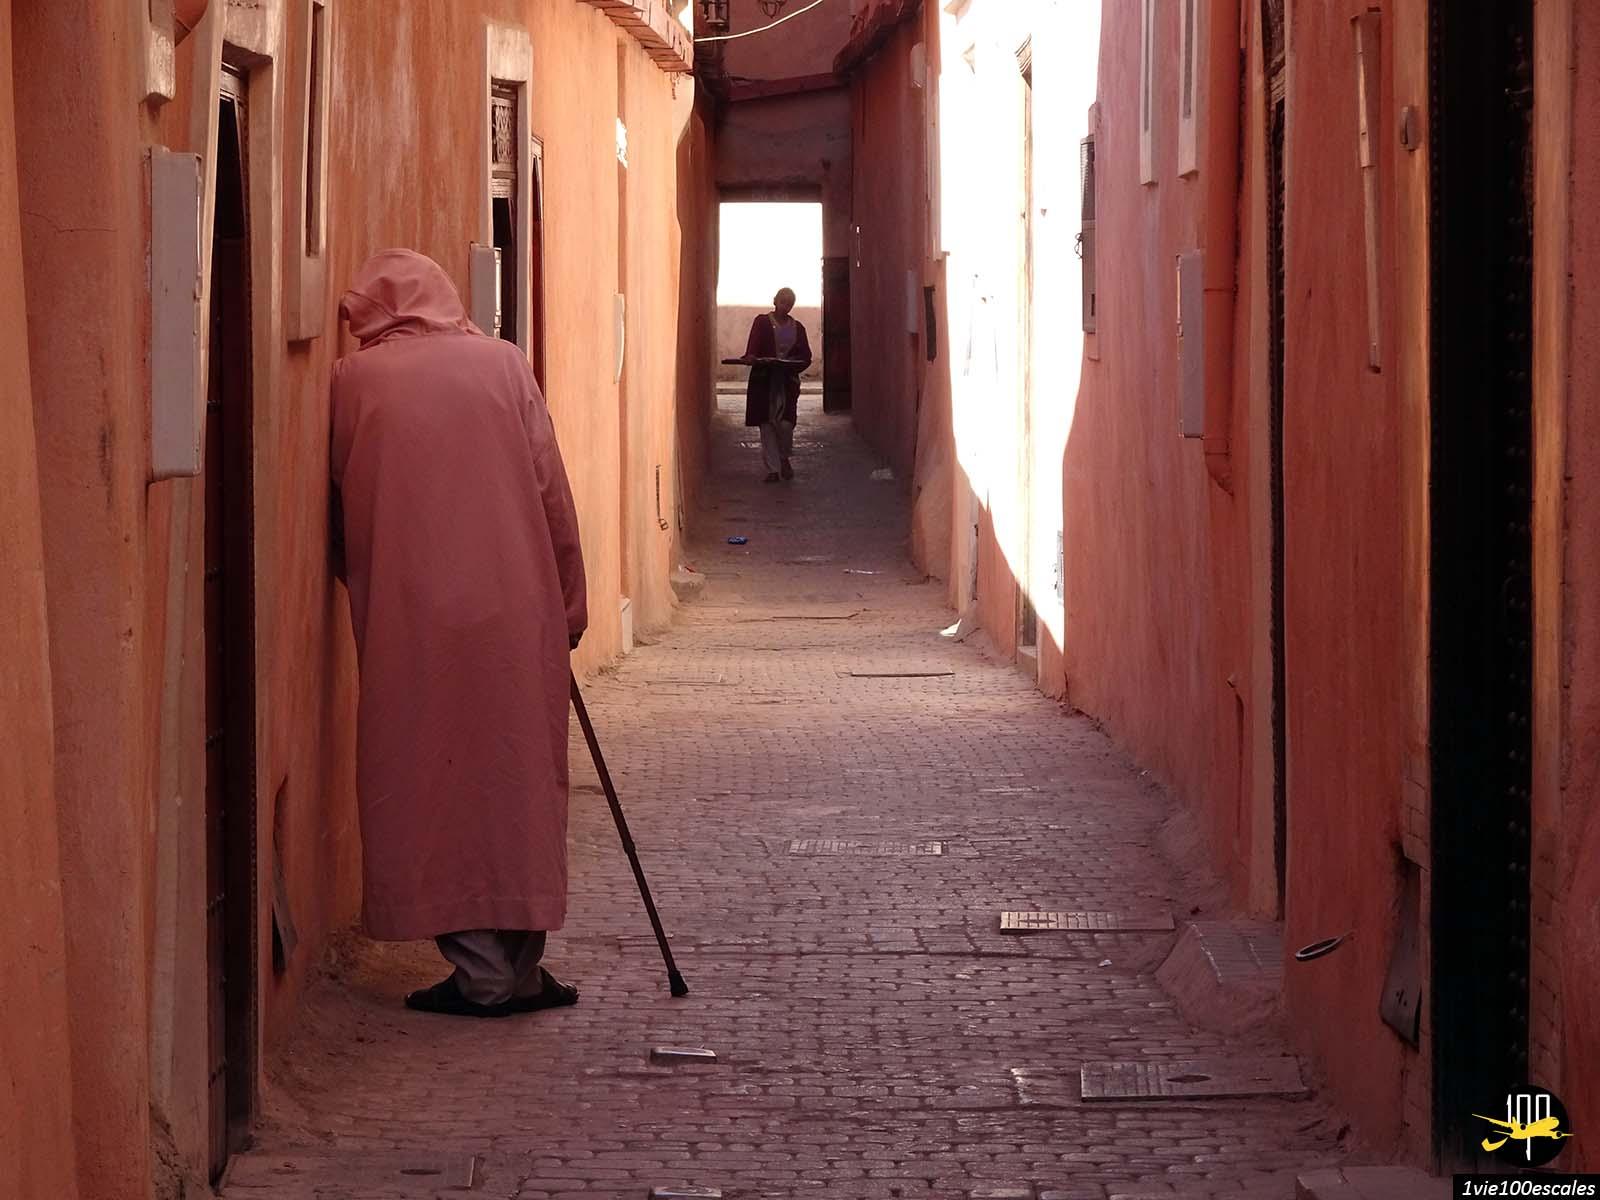 Les ruelles de Mellah le quartier juif de Marrakech